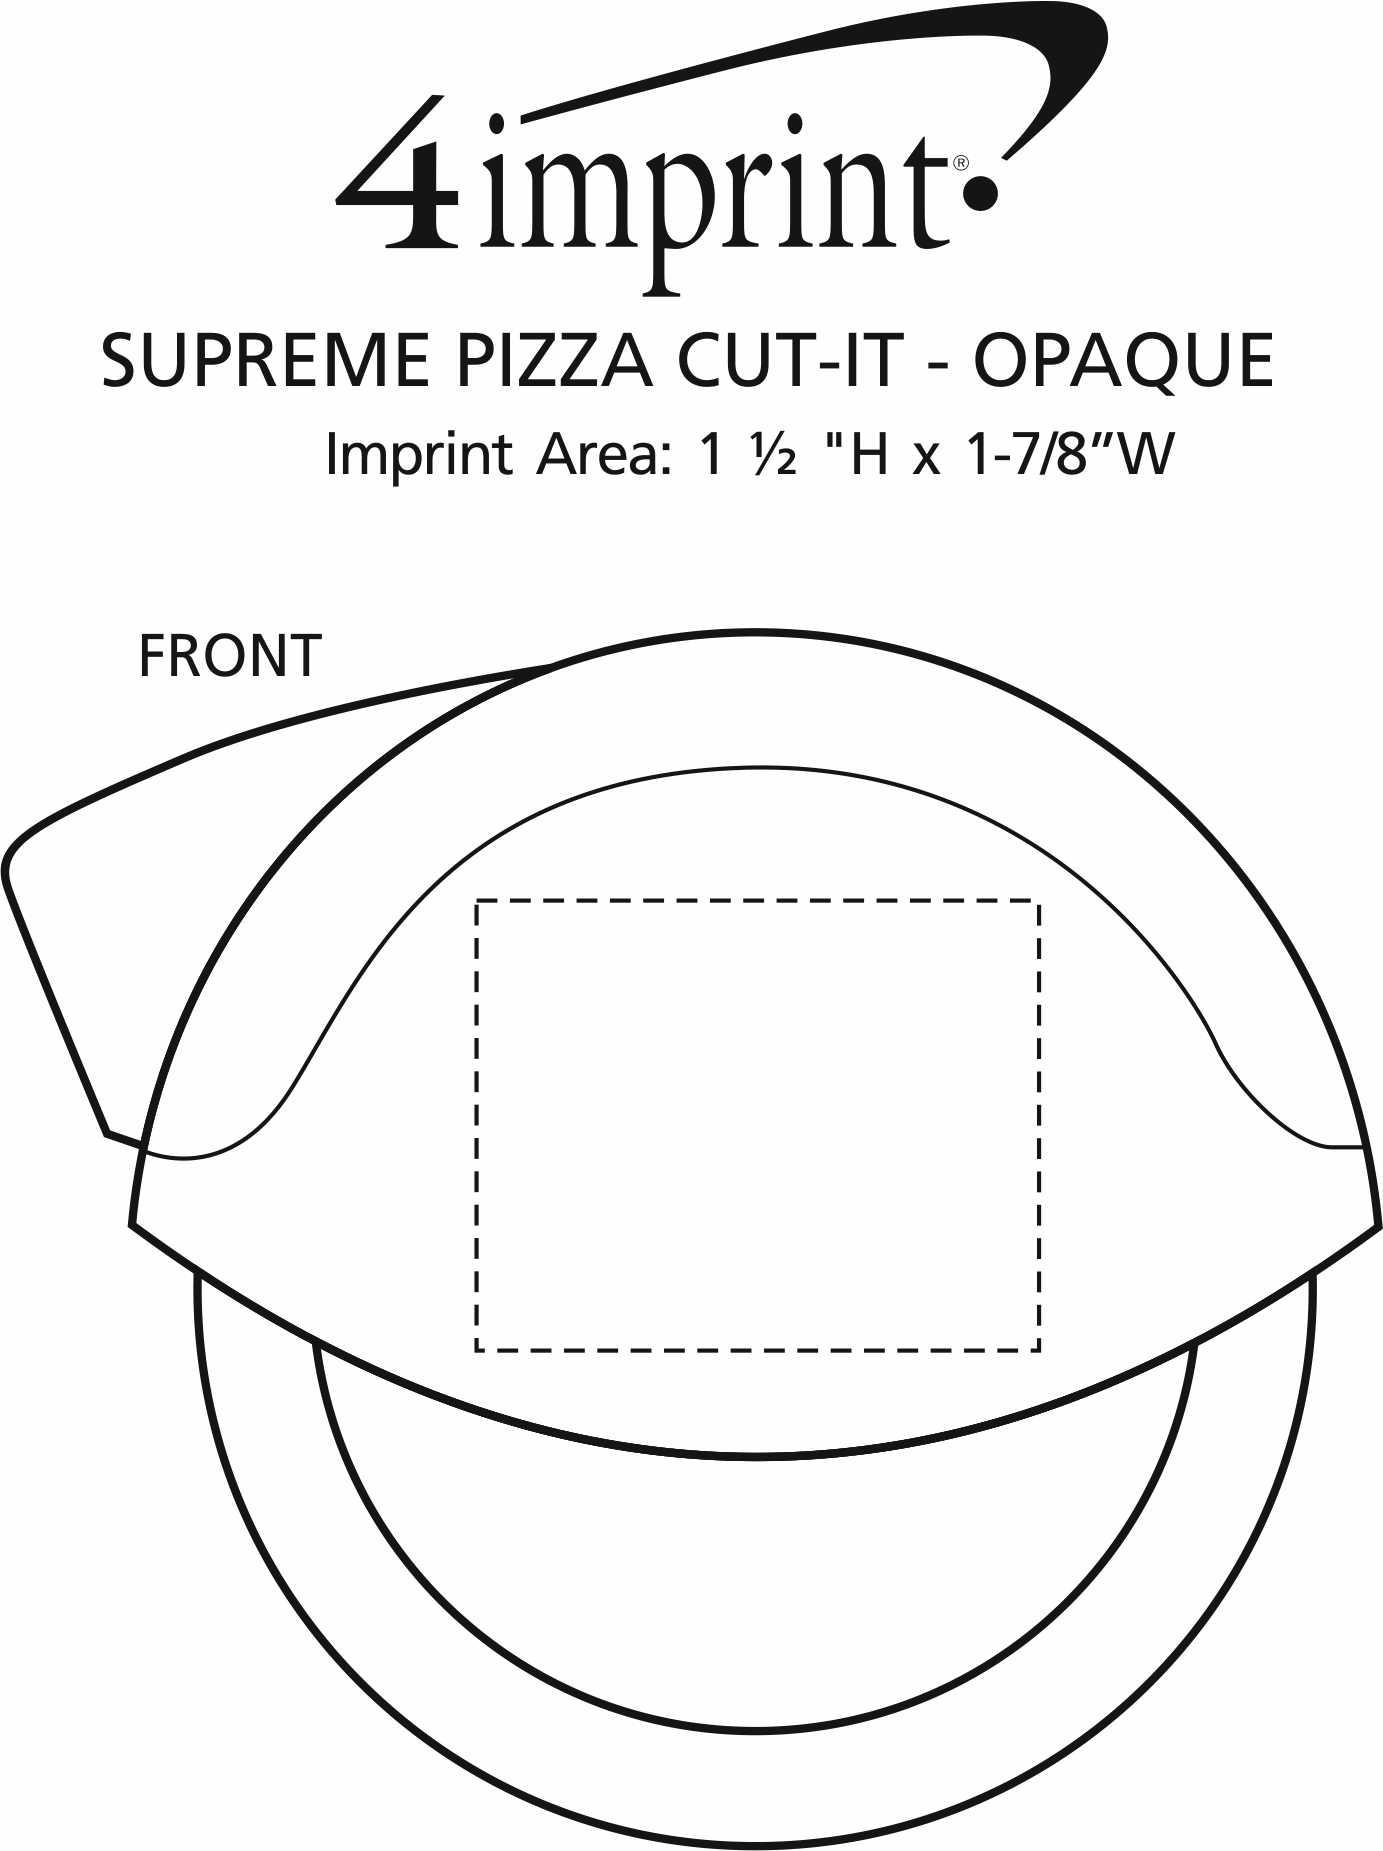 Imprint Area of Supreme Pizza Cut-It - Opaque